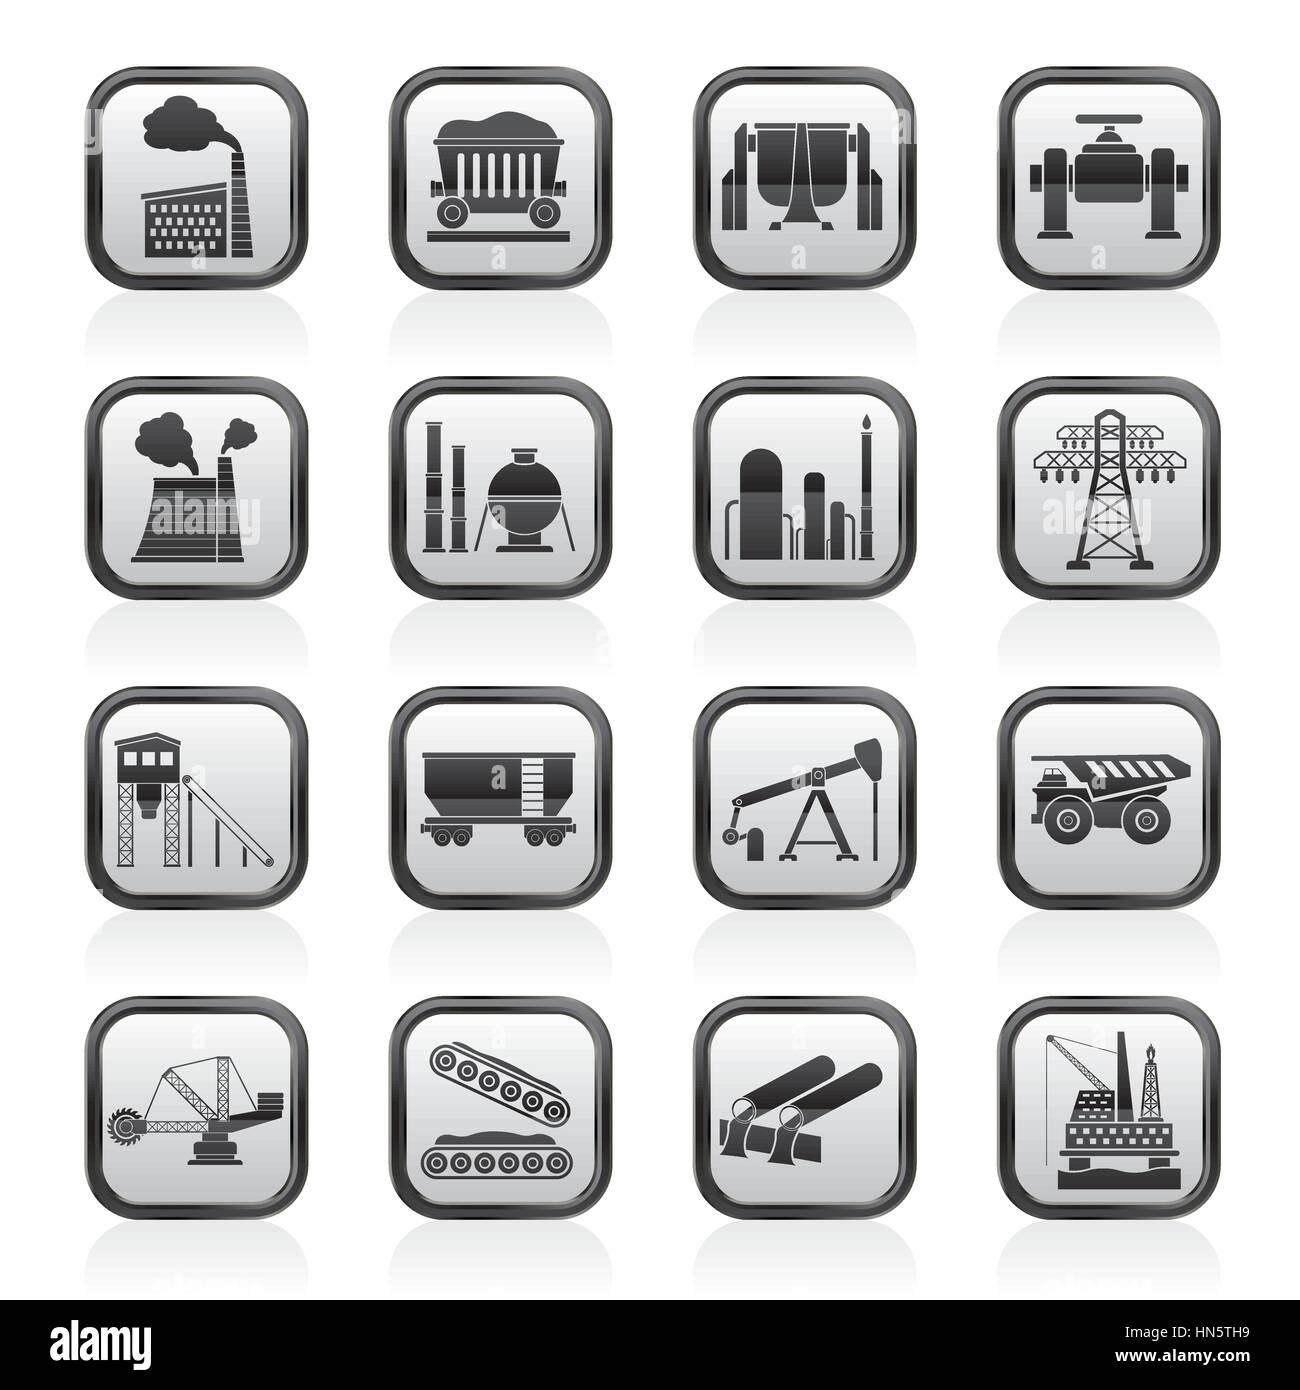 Heavy industry icons Stock Vector